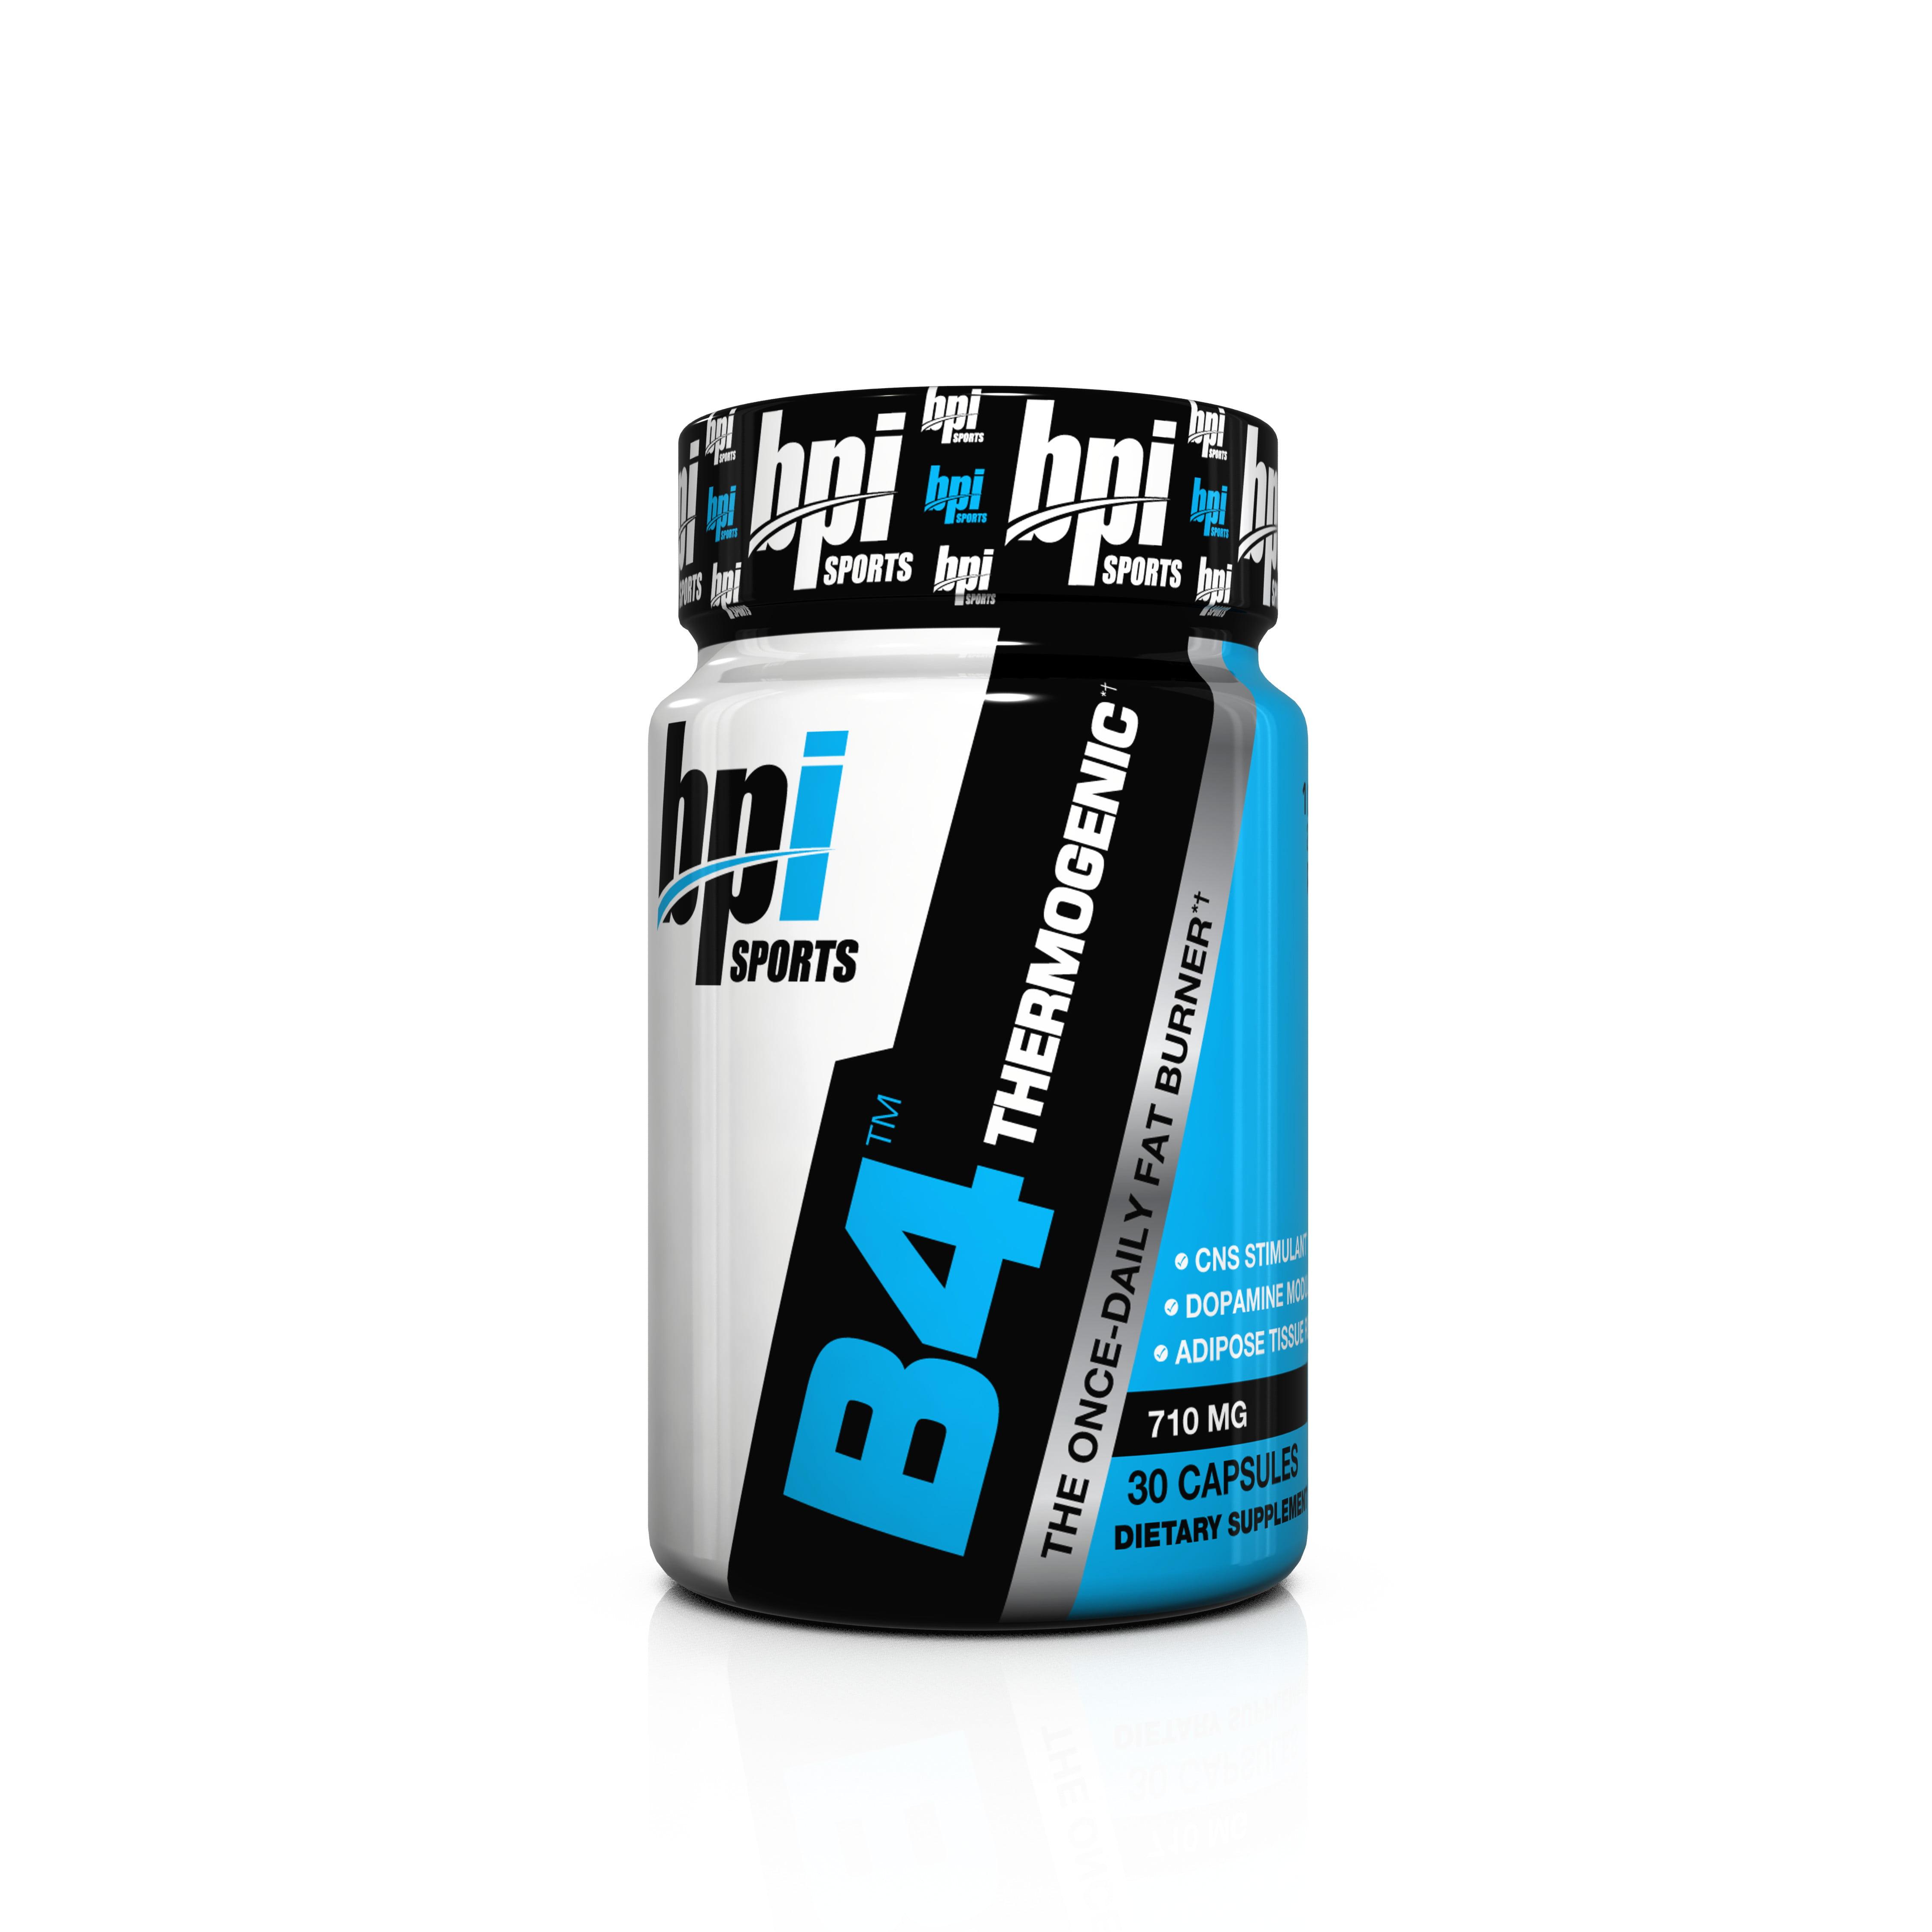 BPI Sports B4 Fat Burner Weight Loss Ctules, Flavorless, 30 Ct